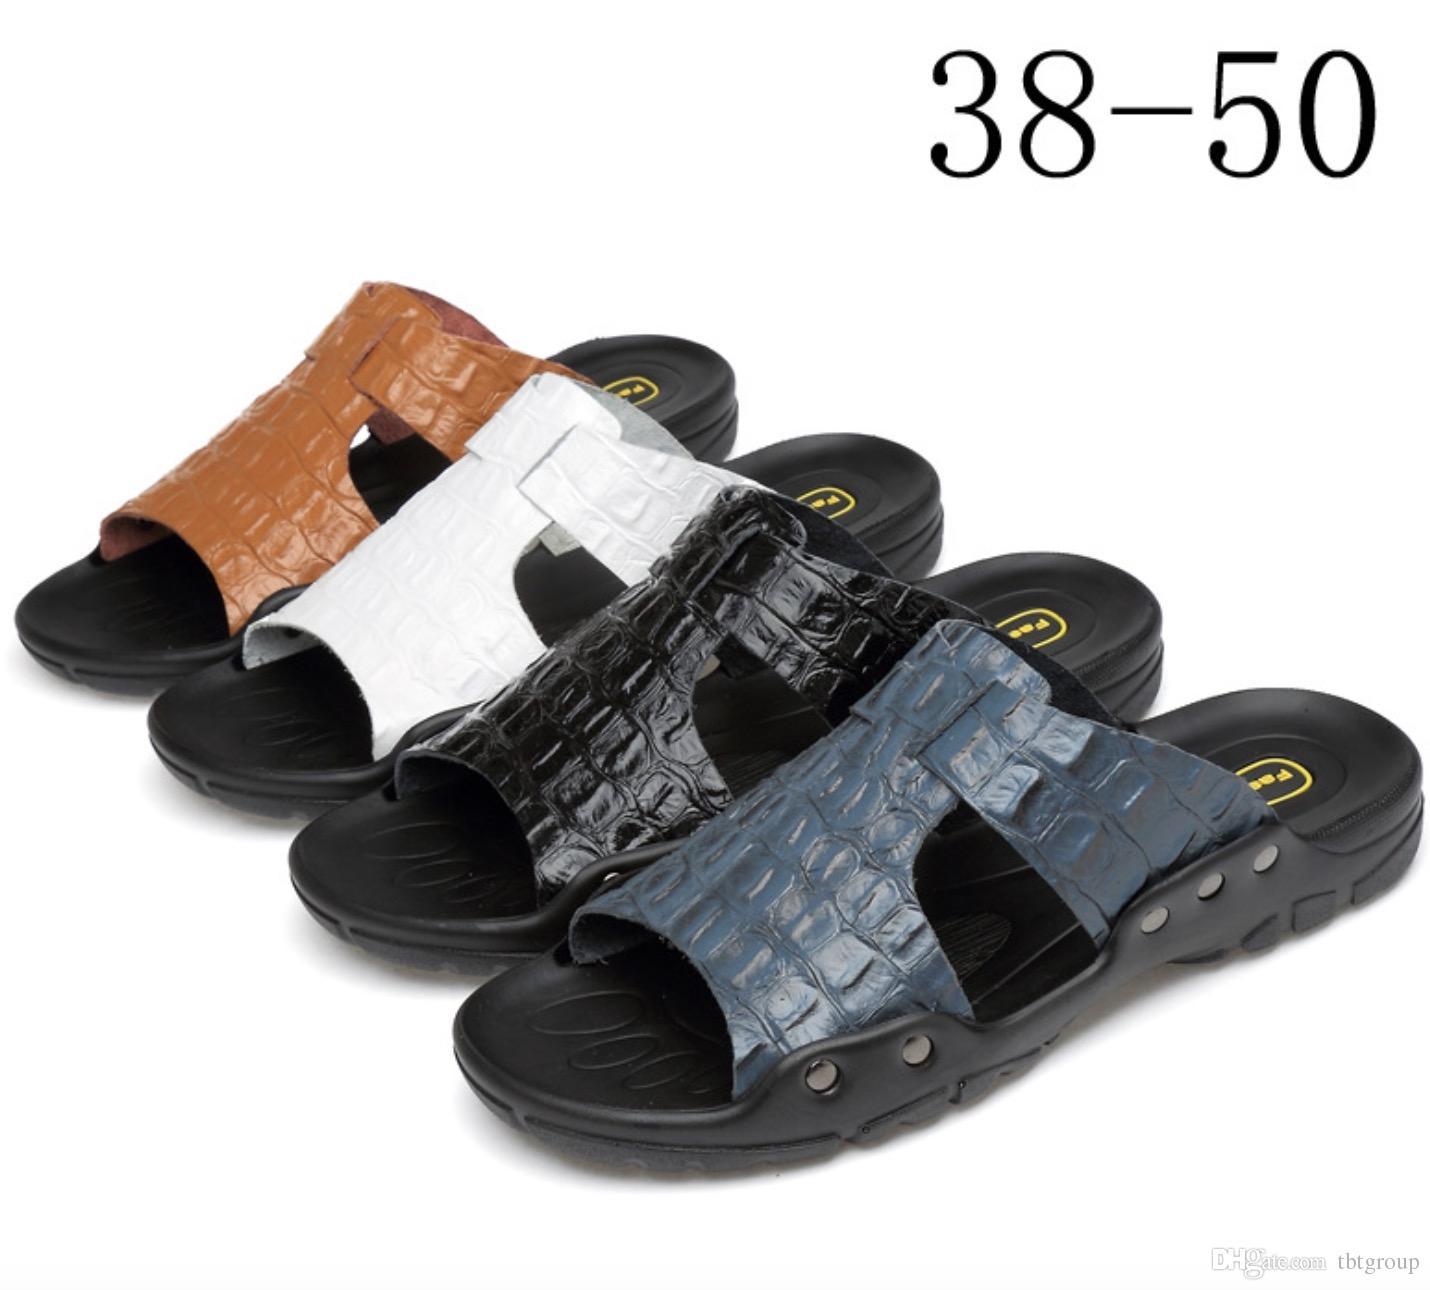 56ea1fcddda4b 2019 Genuine Leather Men Flip Flops Slippers Crocodile Design Brand Sandals  Summer Seaside Beach Flats Shoes Large Size US 7 15 Leather Boots For Women  ...